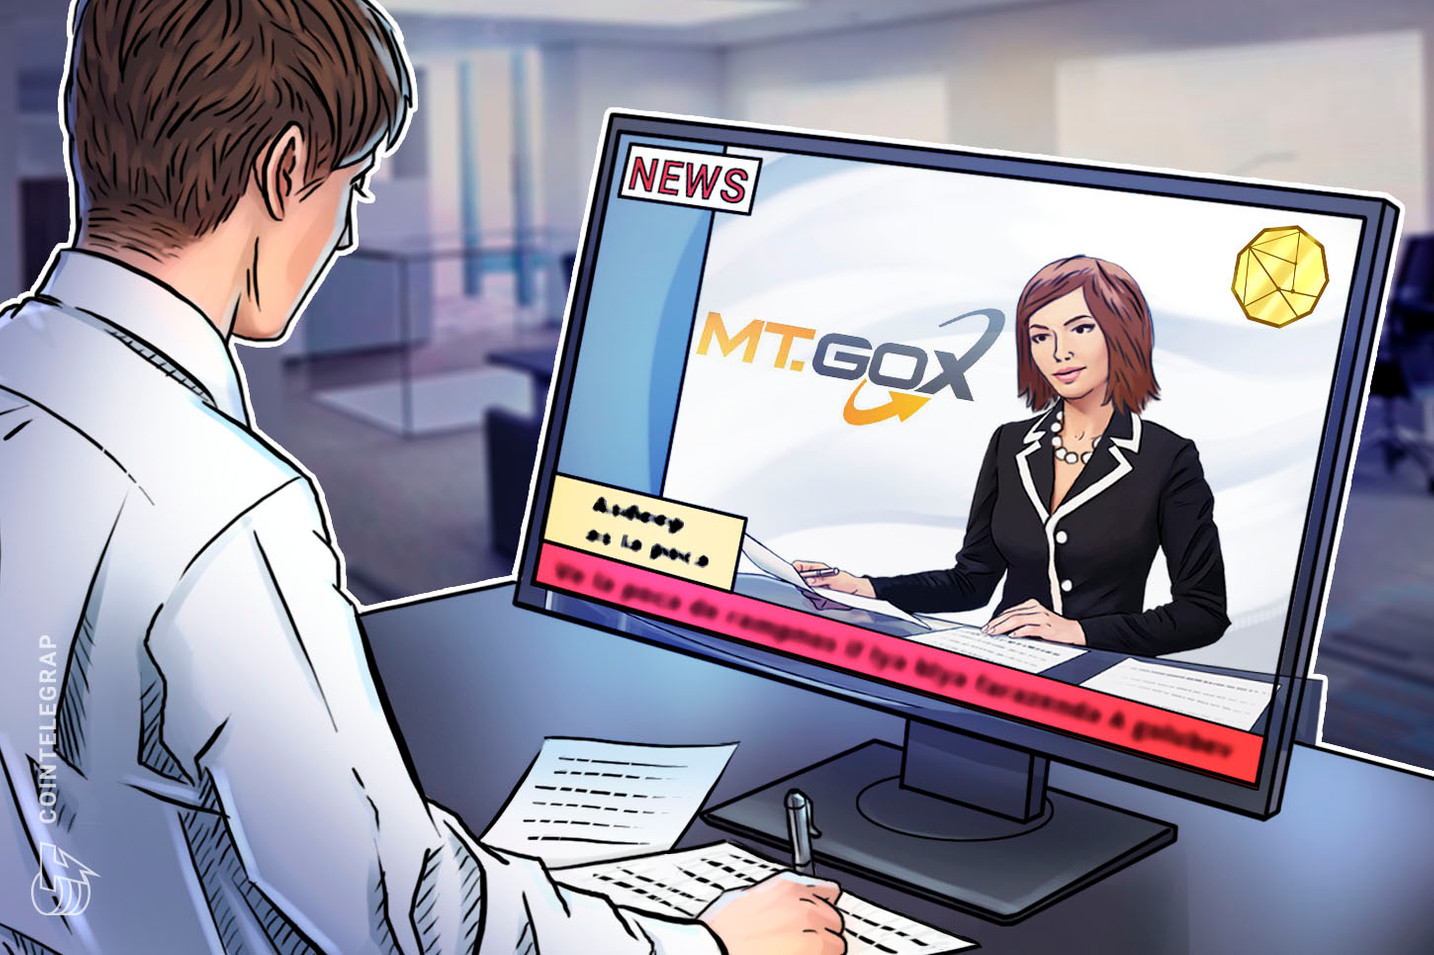 Mt. Gox Trustee Announces Efforts to Extend Deadline for Civil Rehabilitation Claims